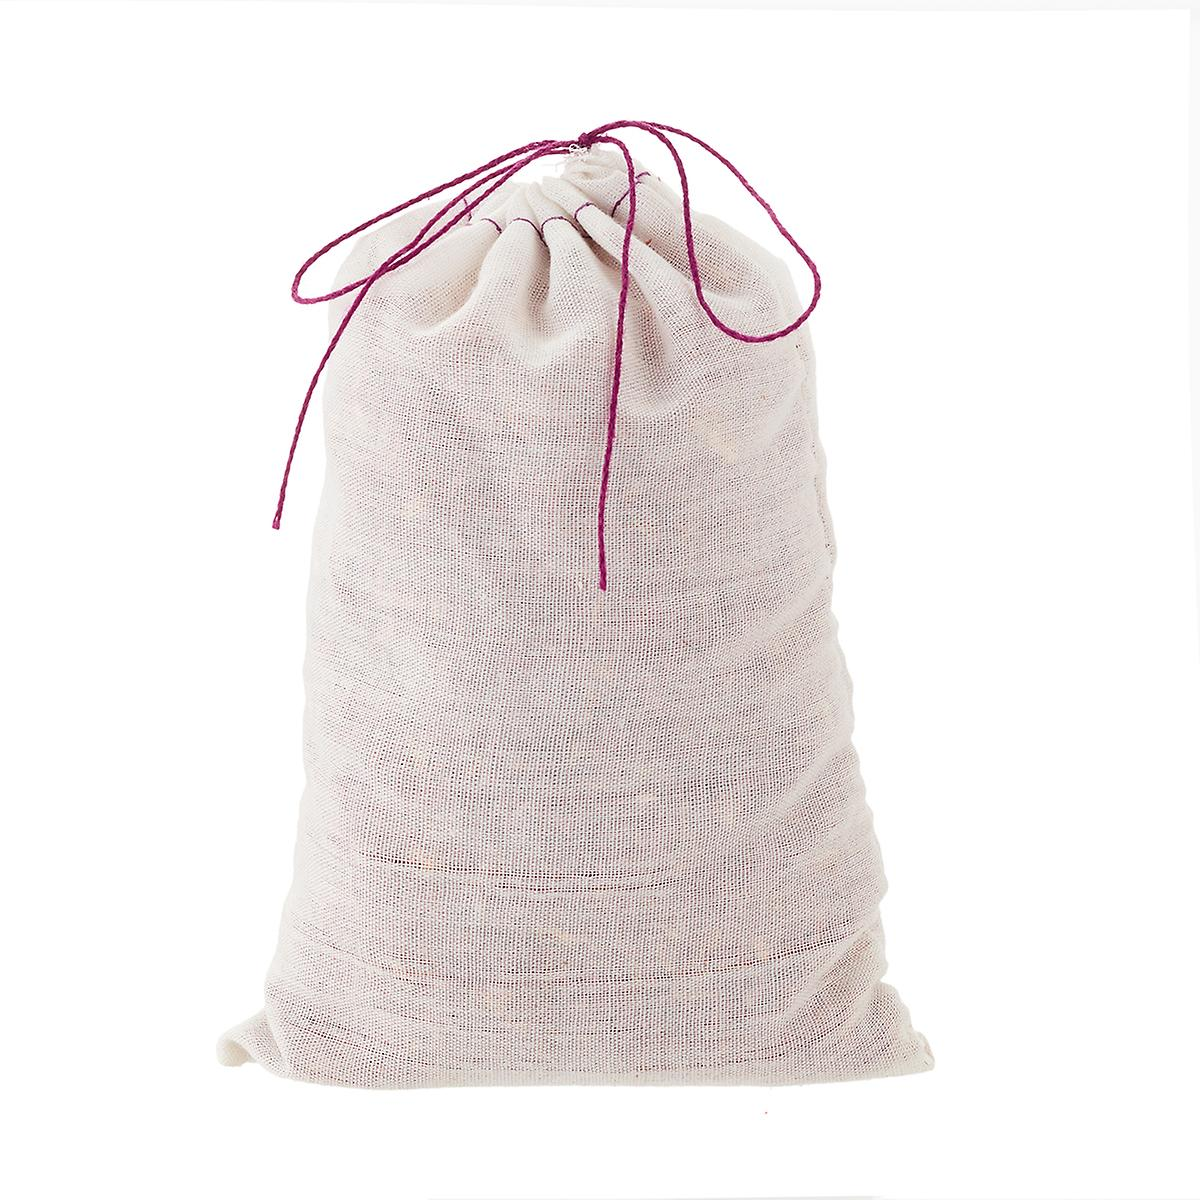 Cedar & Lavender Sachet